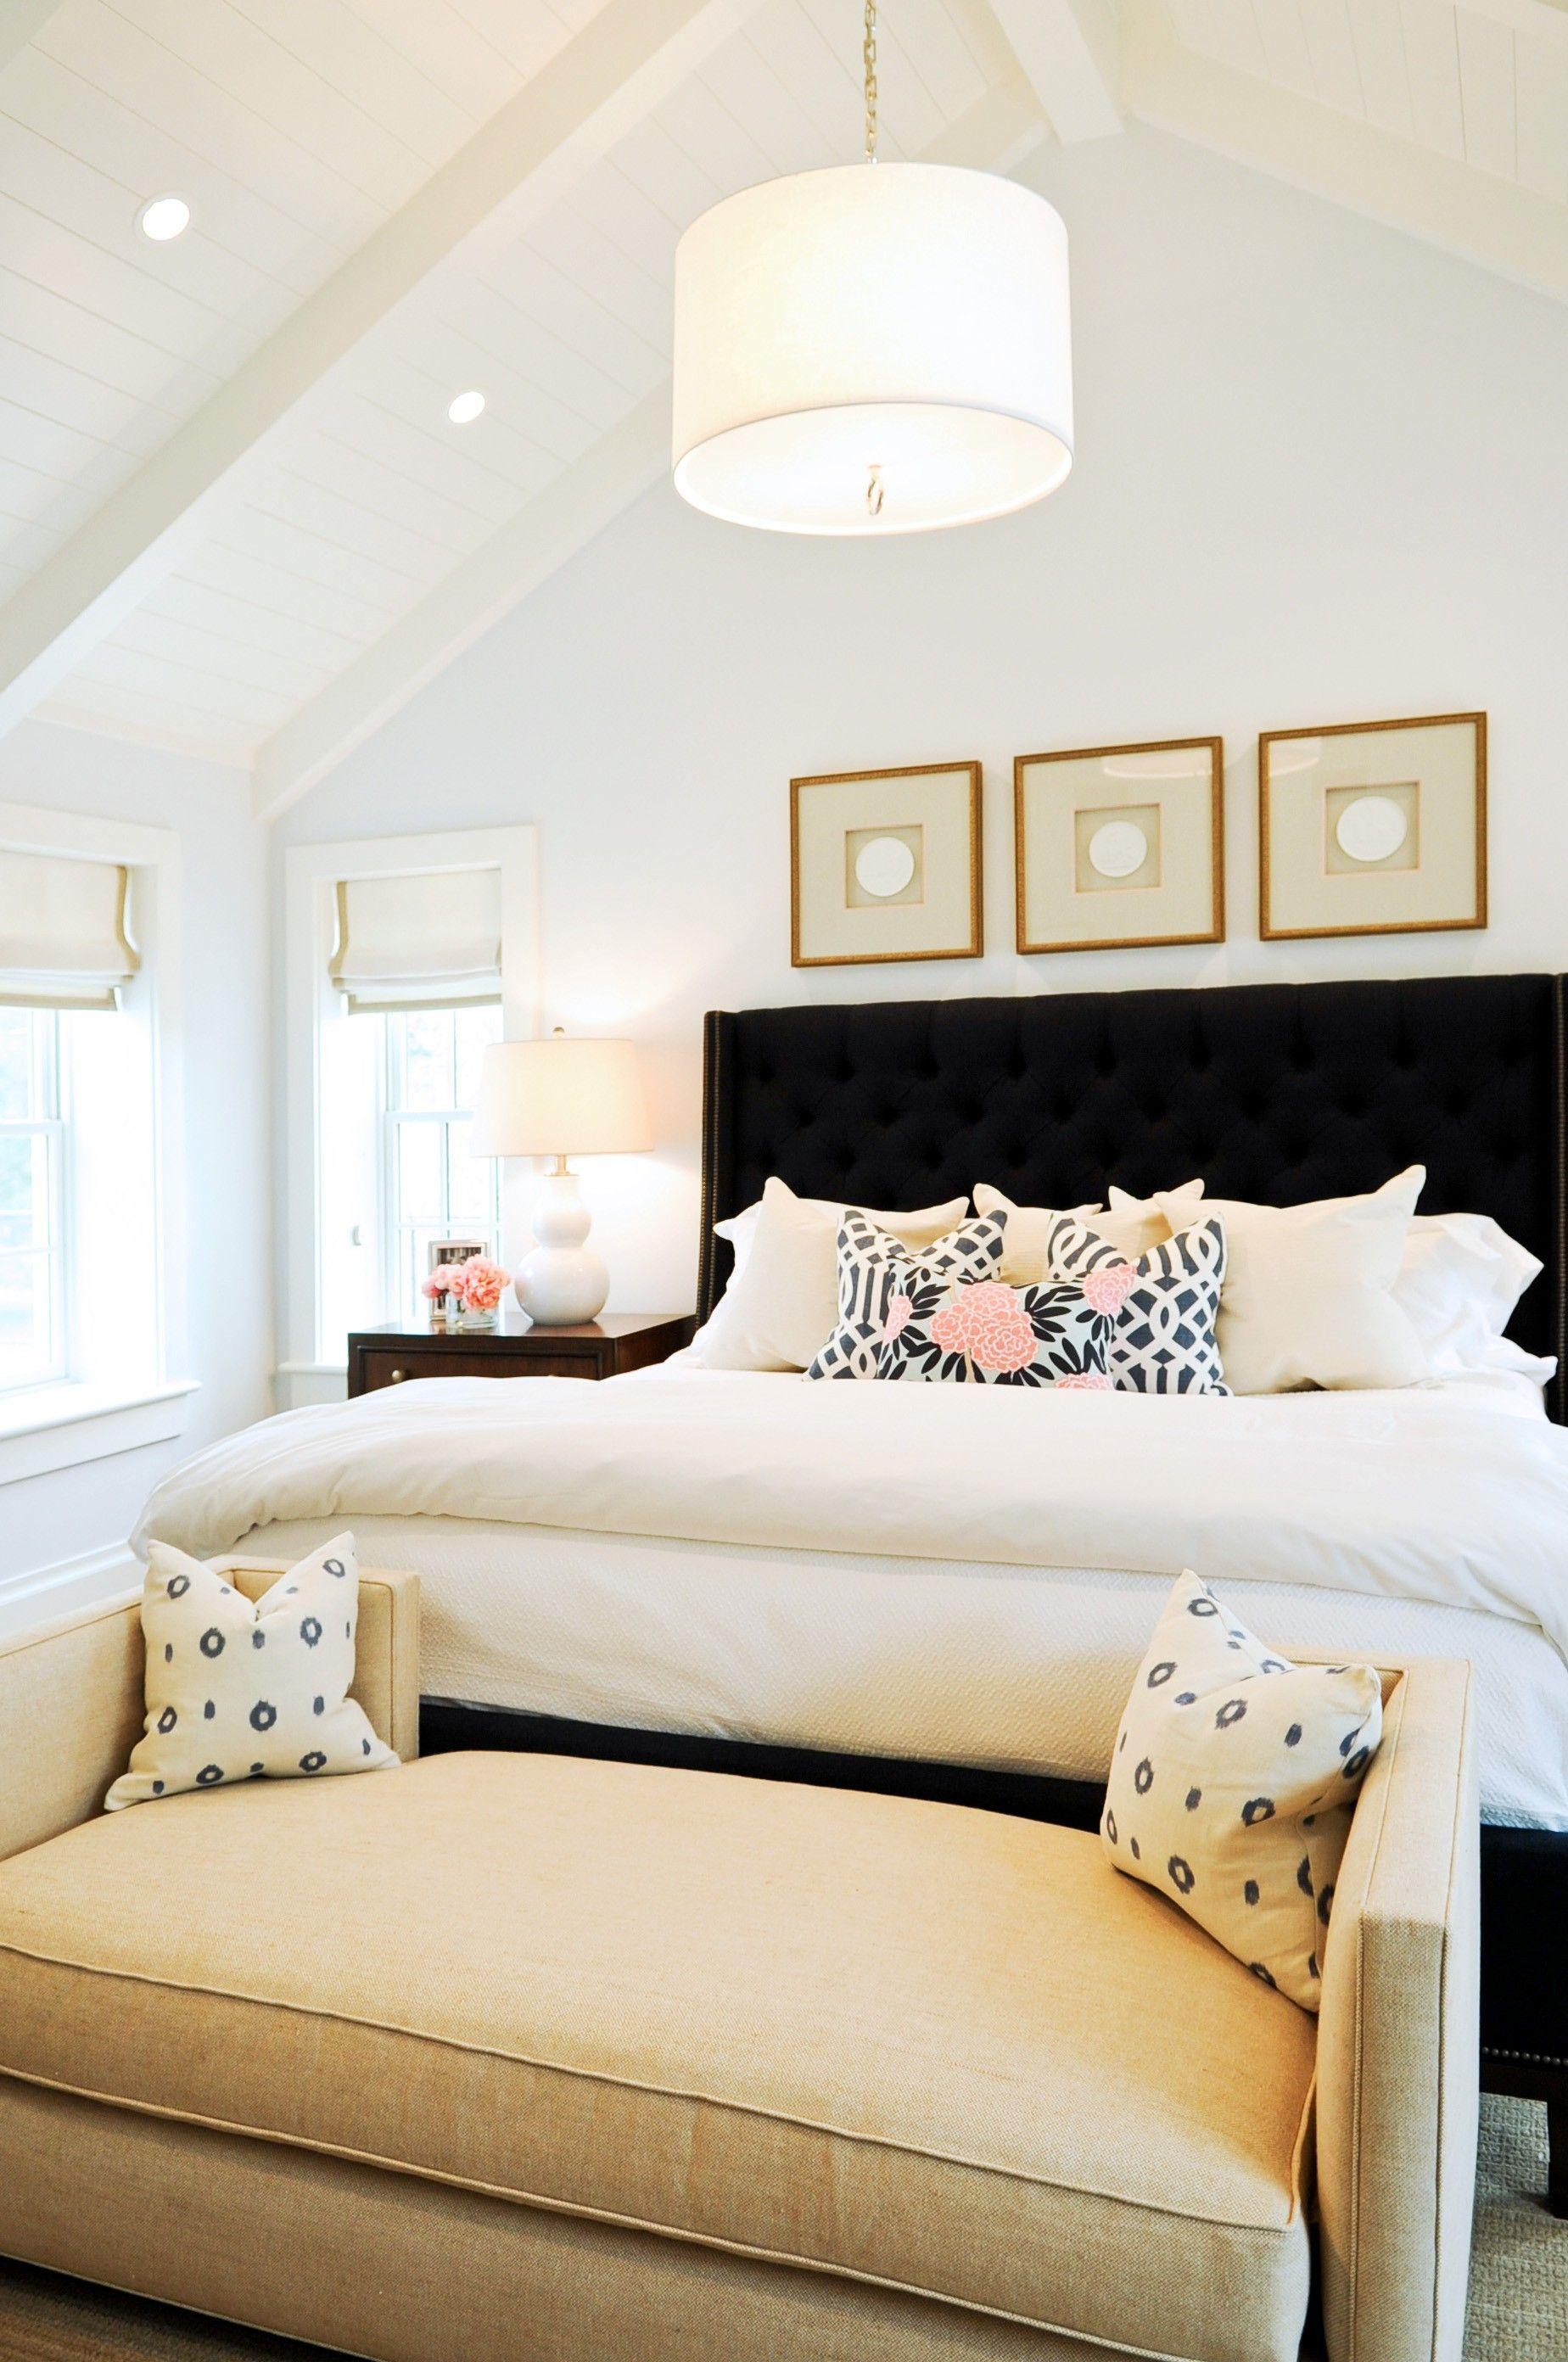 Opal Design Group - Light Your Home Like a Pro